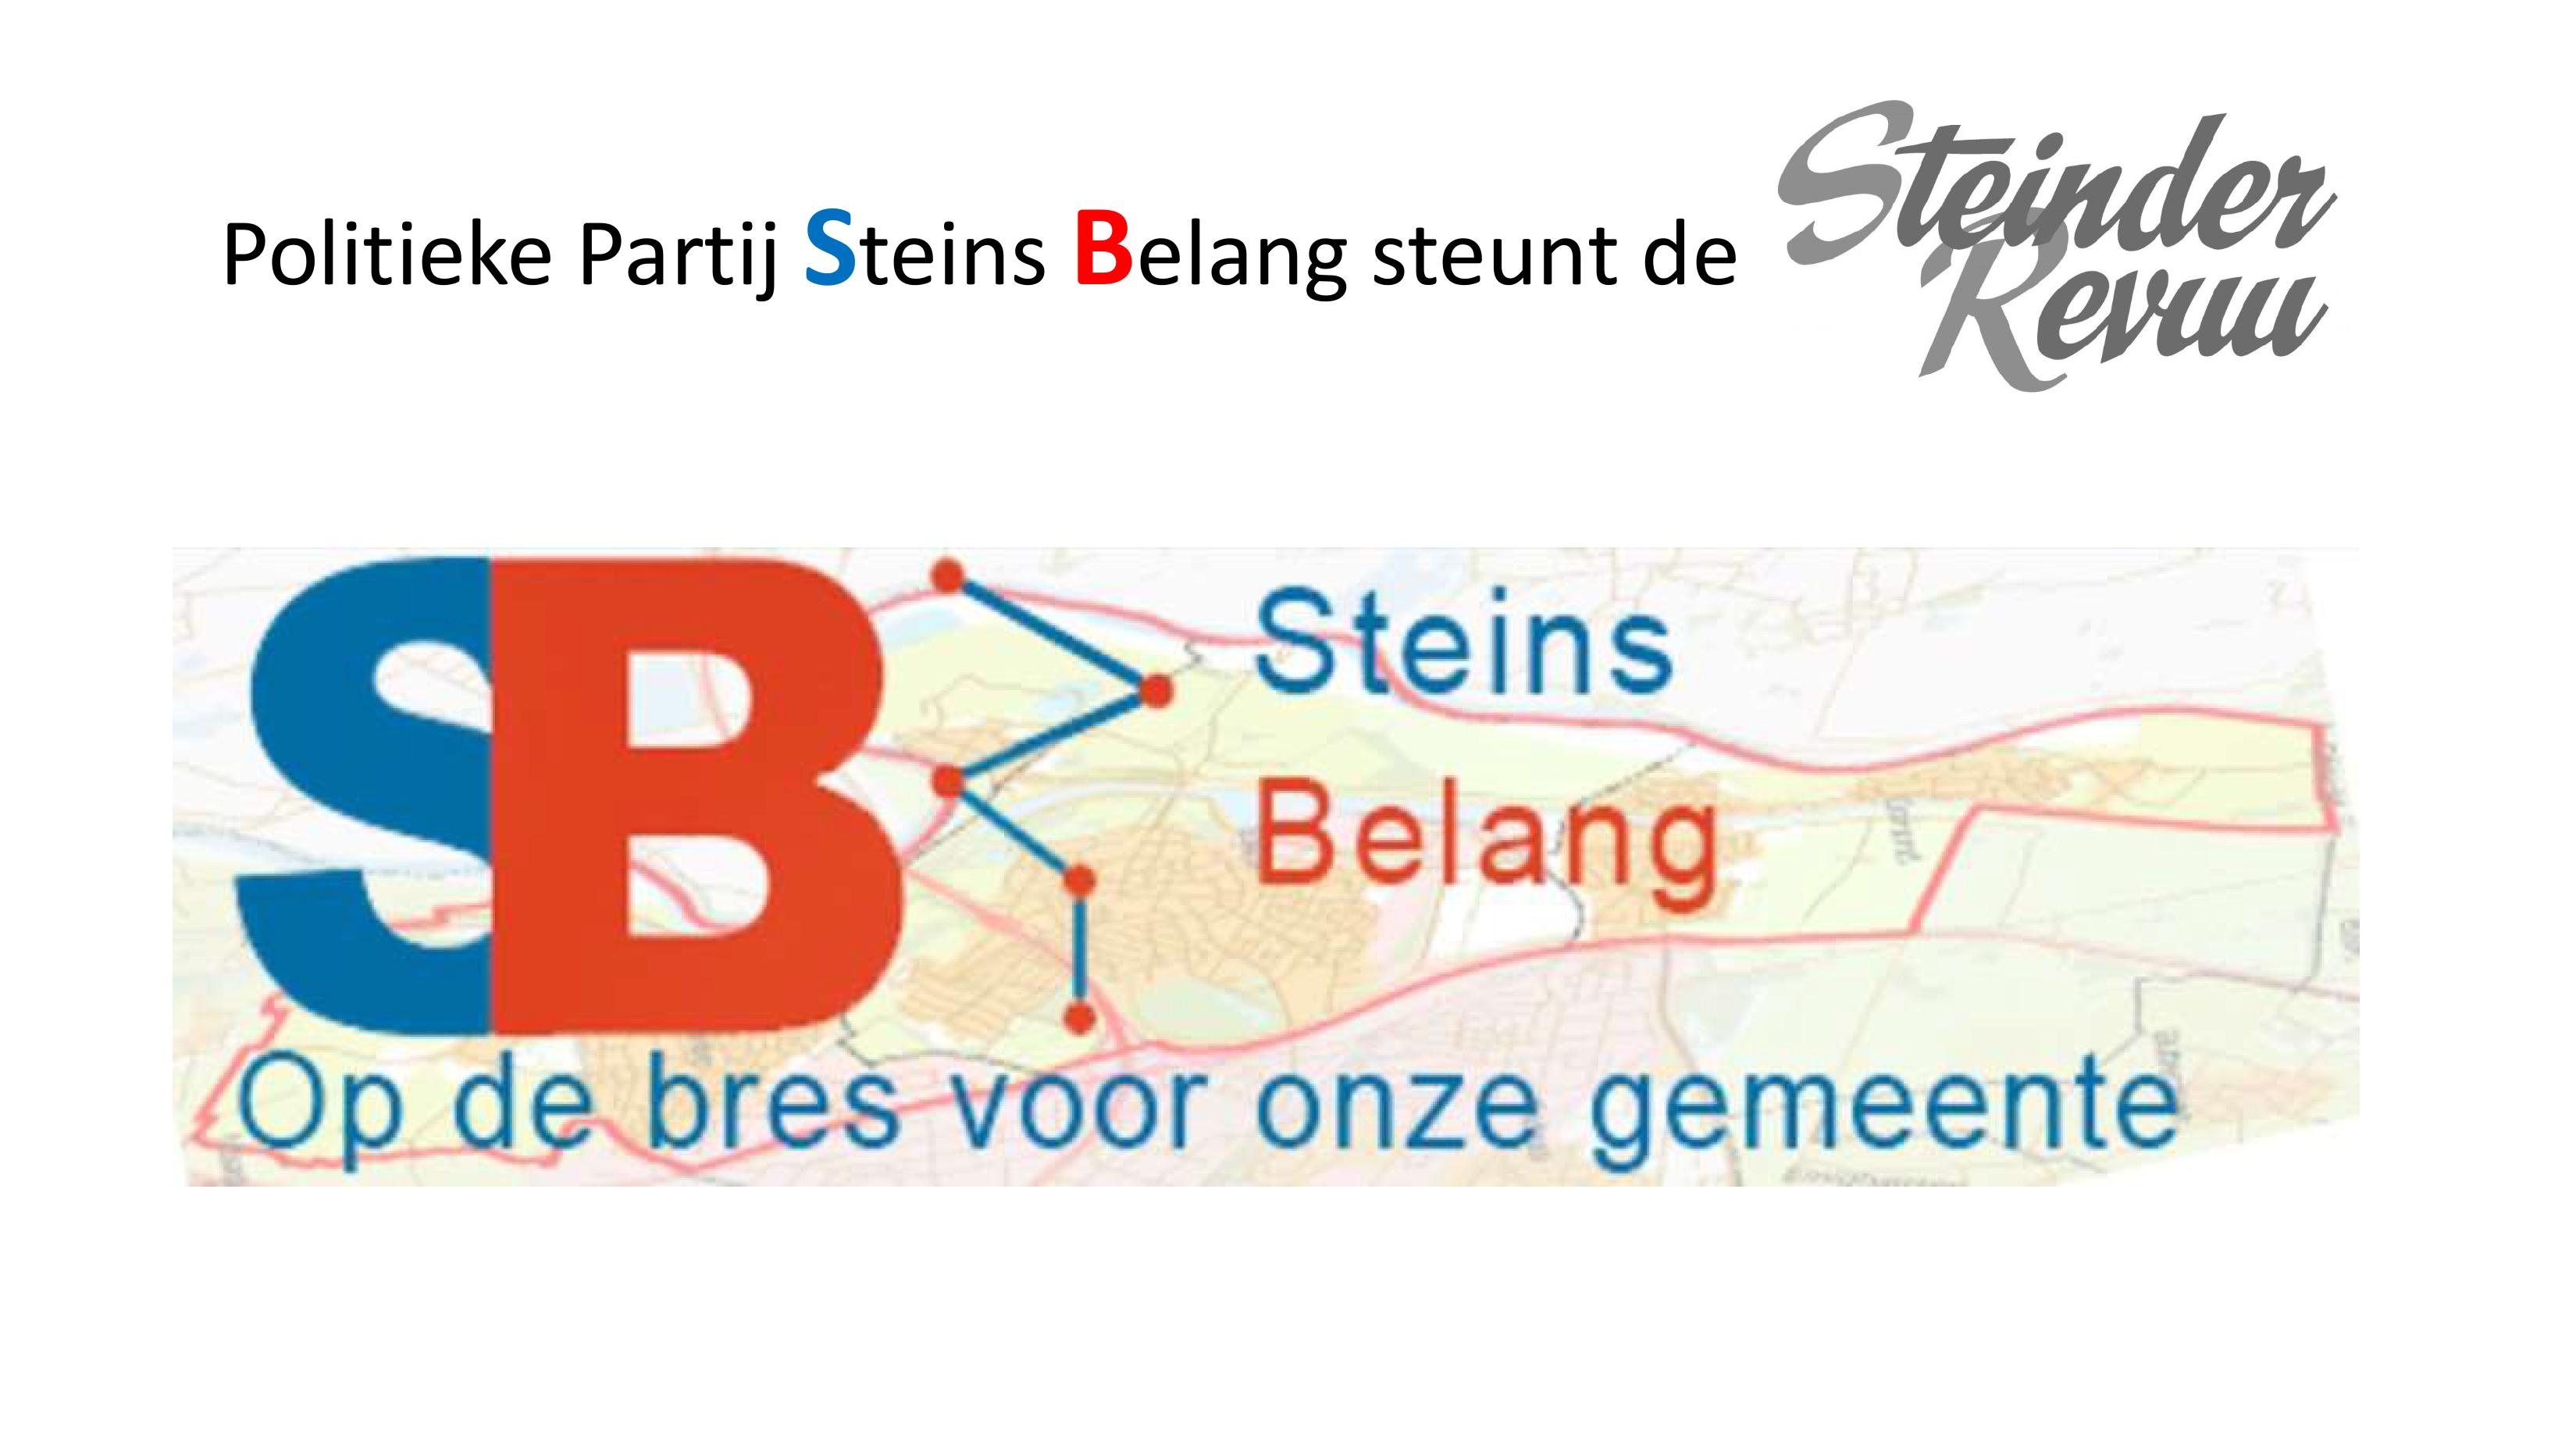 Politieke Partij Steins Belang